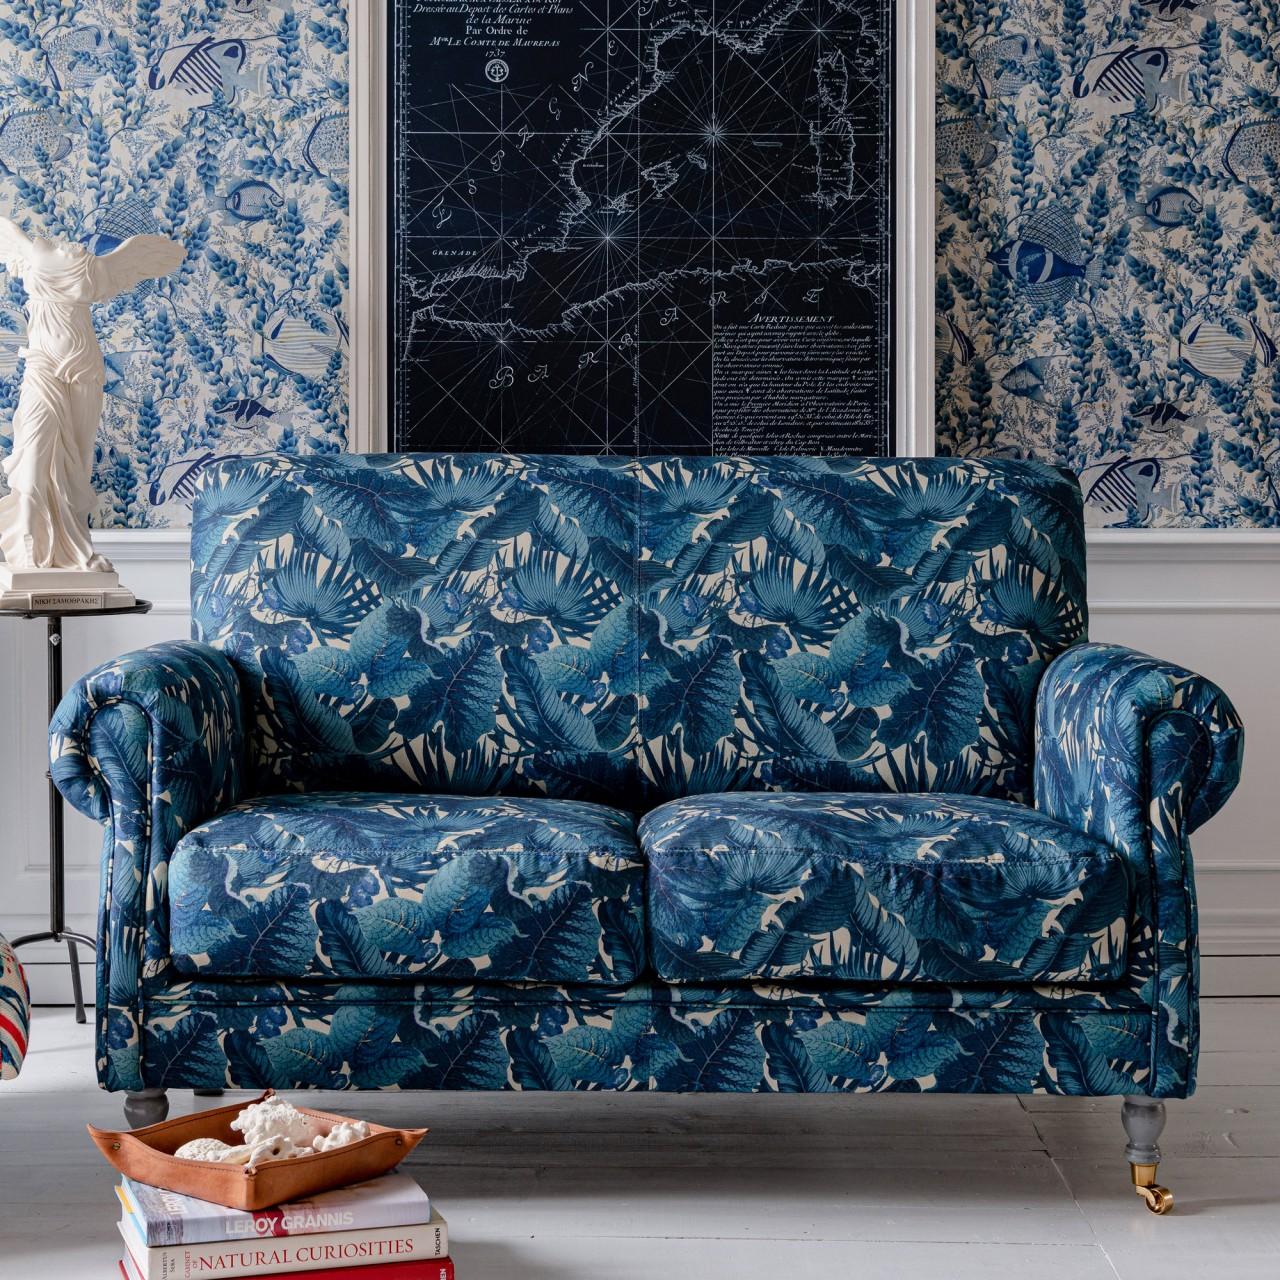 EDINBURGH SOFA - PARADEISOS Fabric